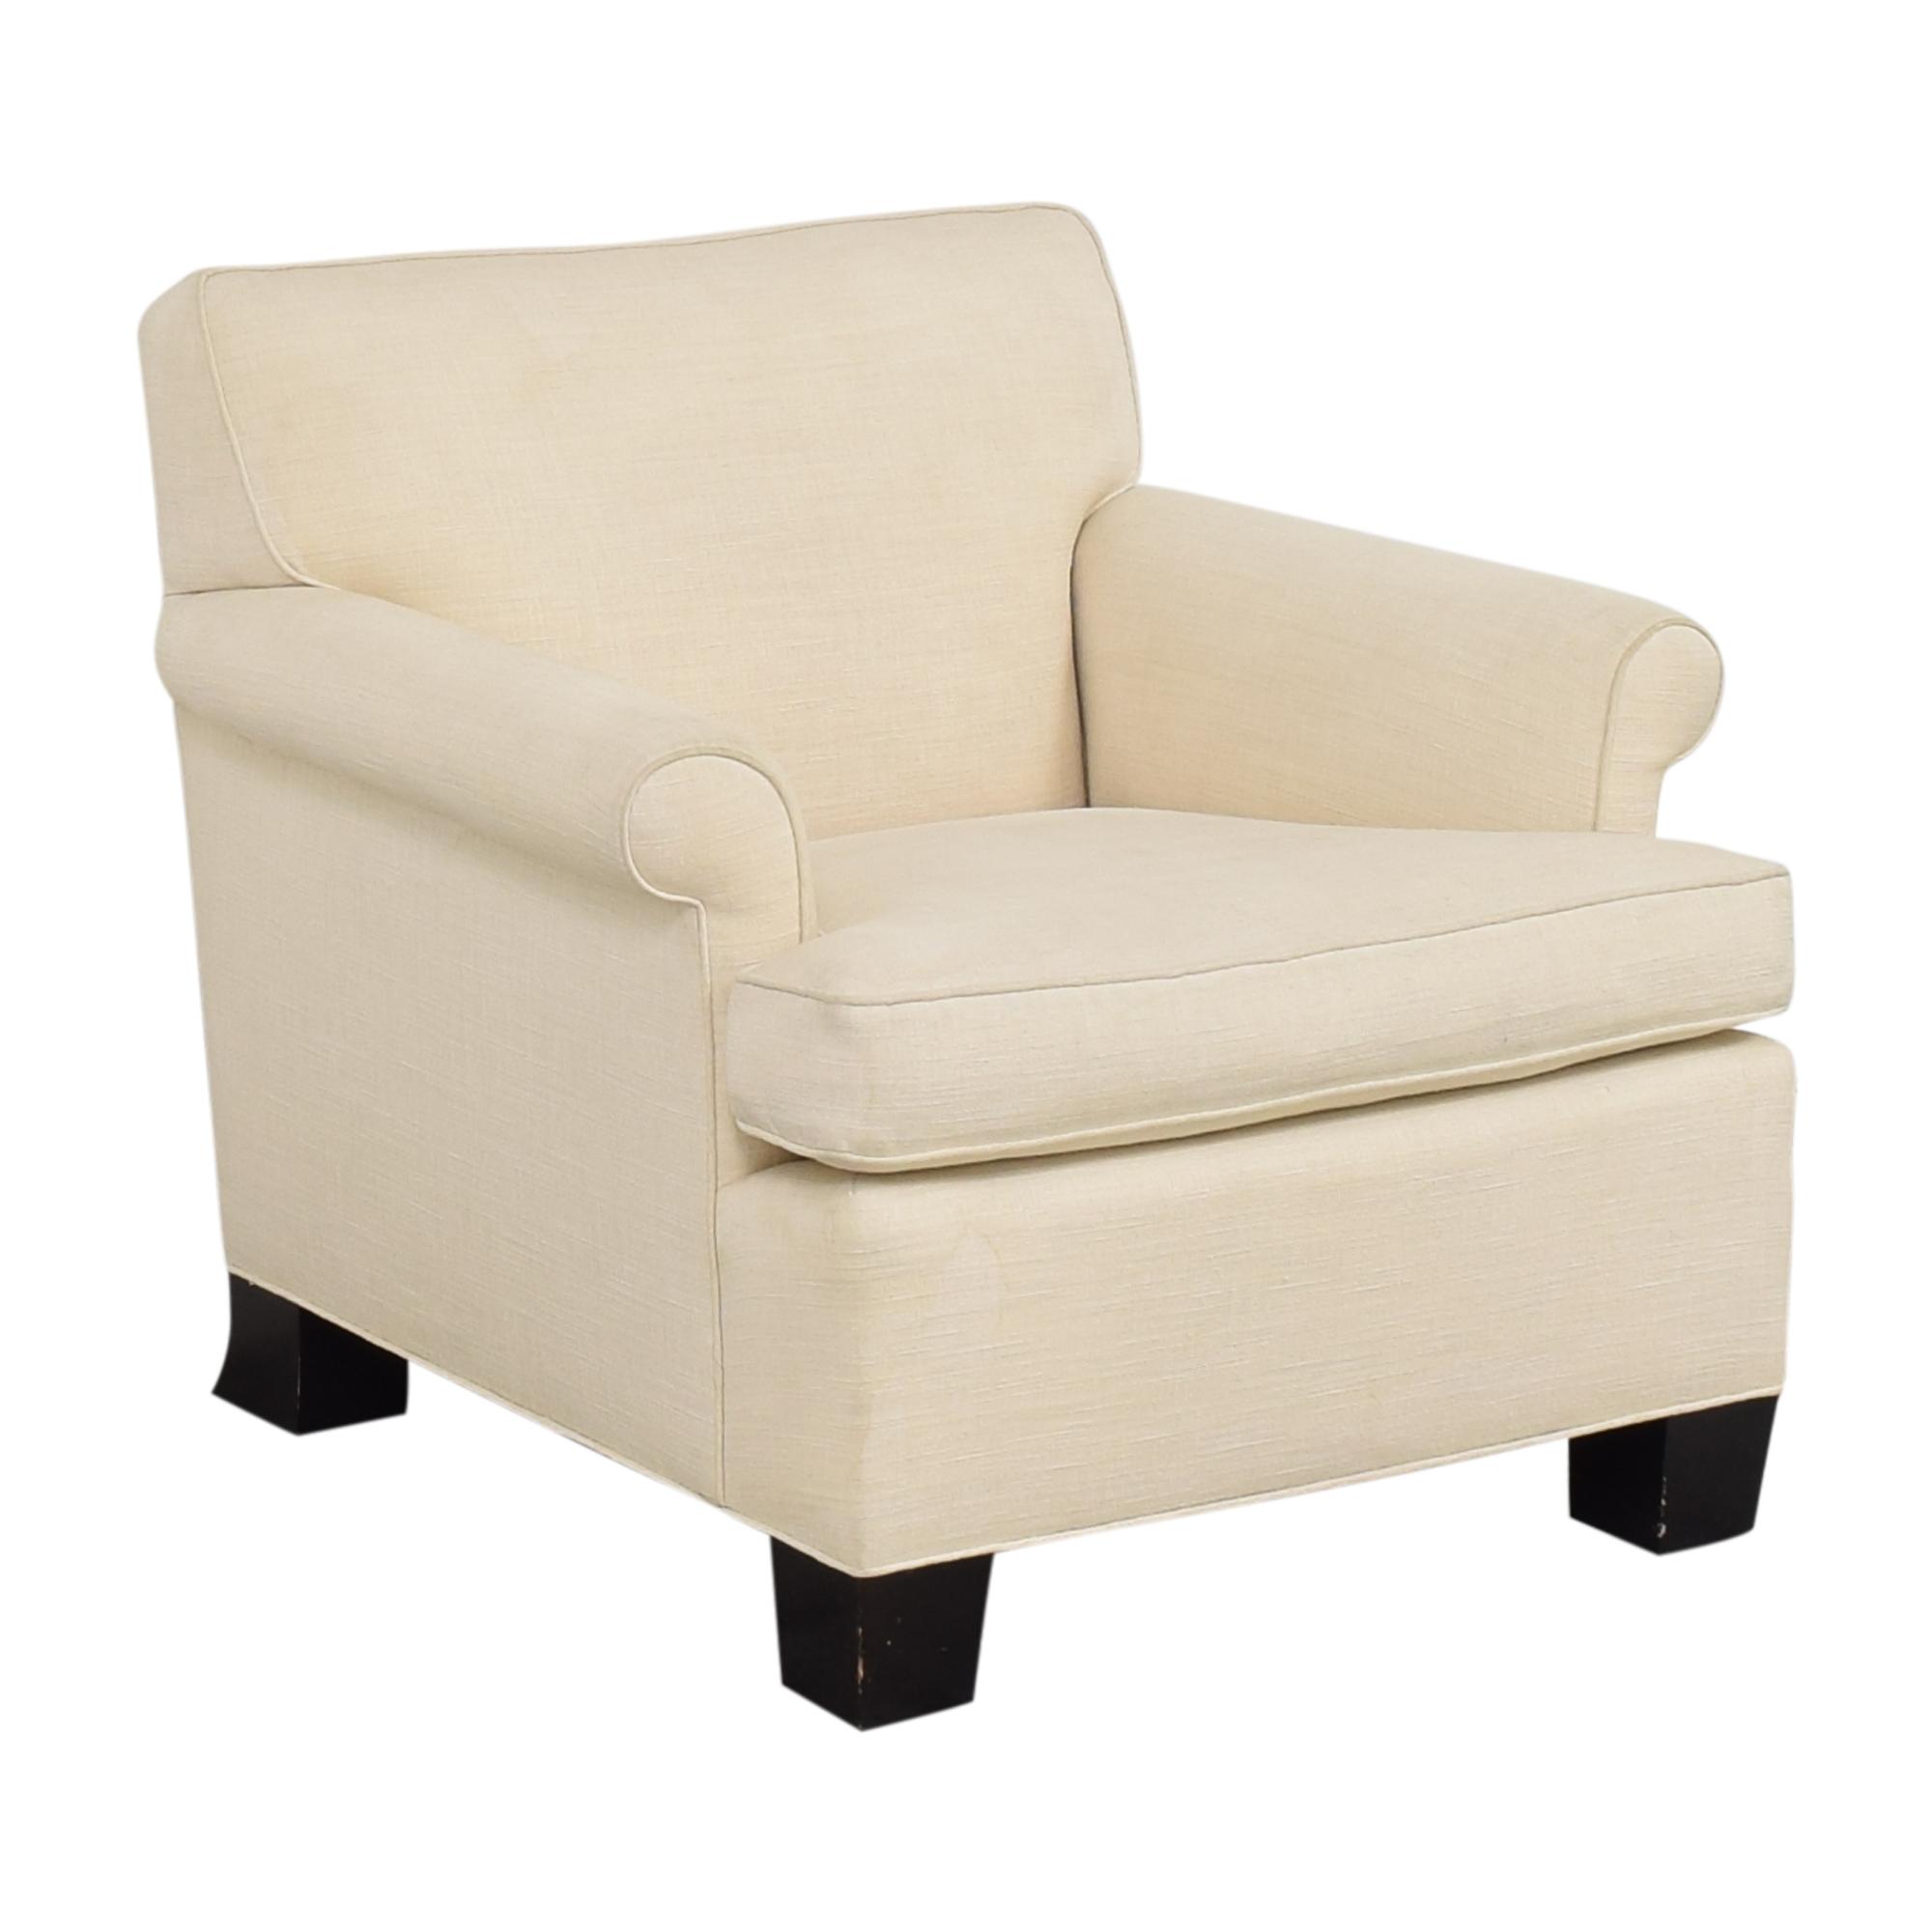 Brunschwig & Fils Brunschwig & Fils Custom Odom Chair for sale